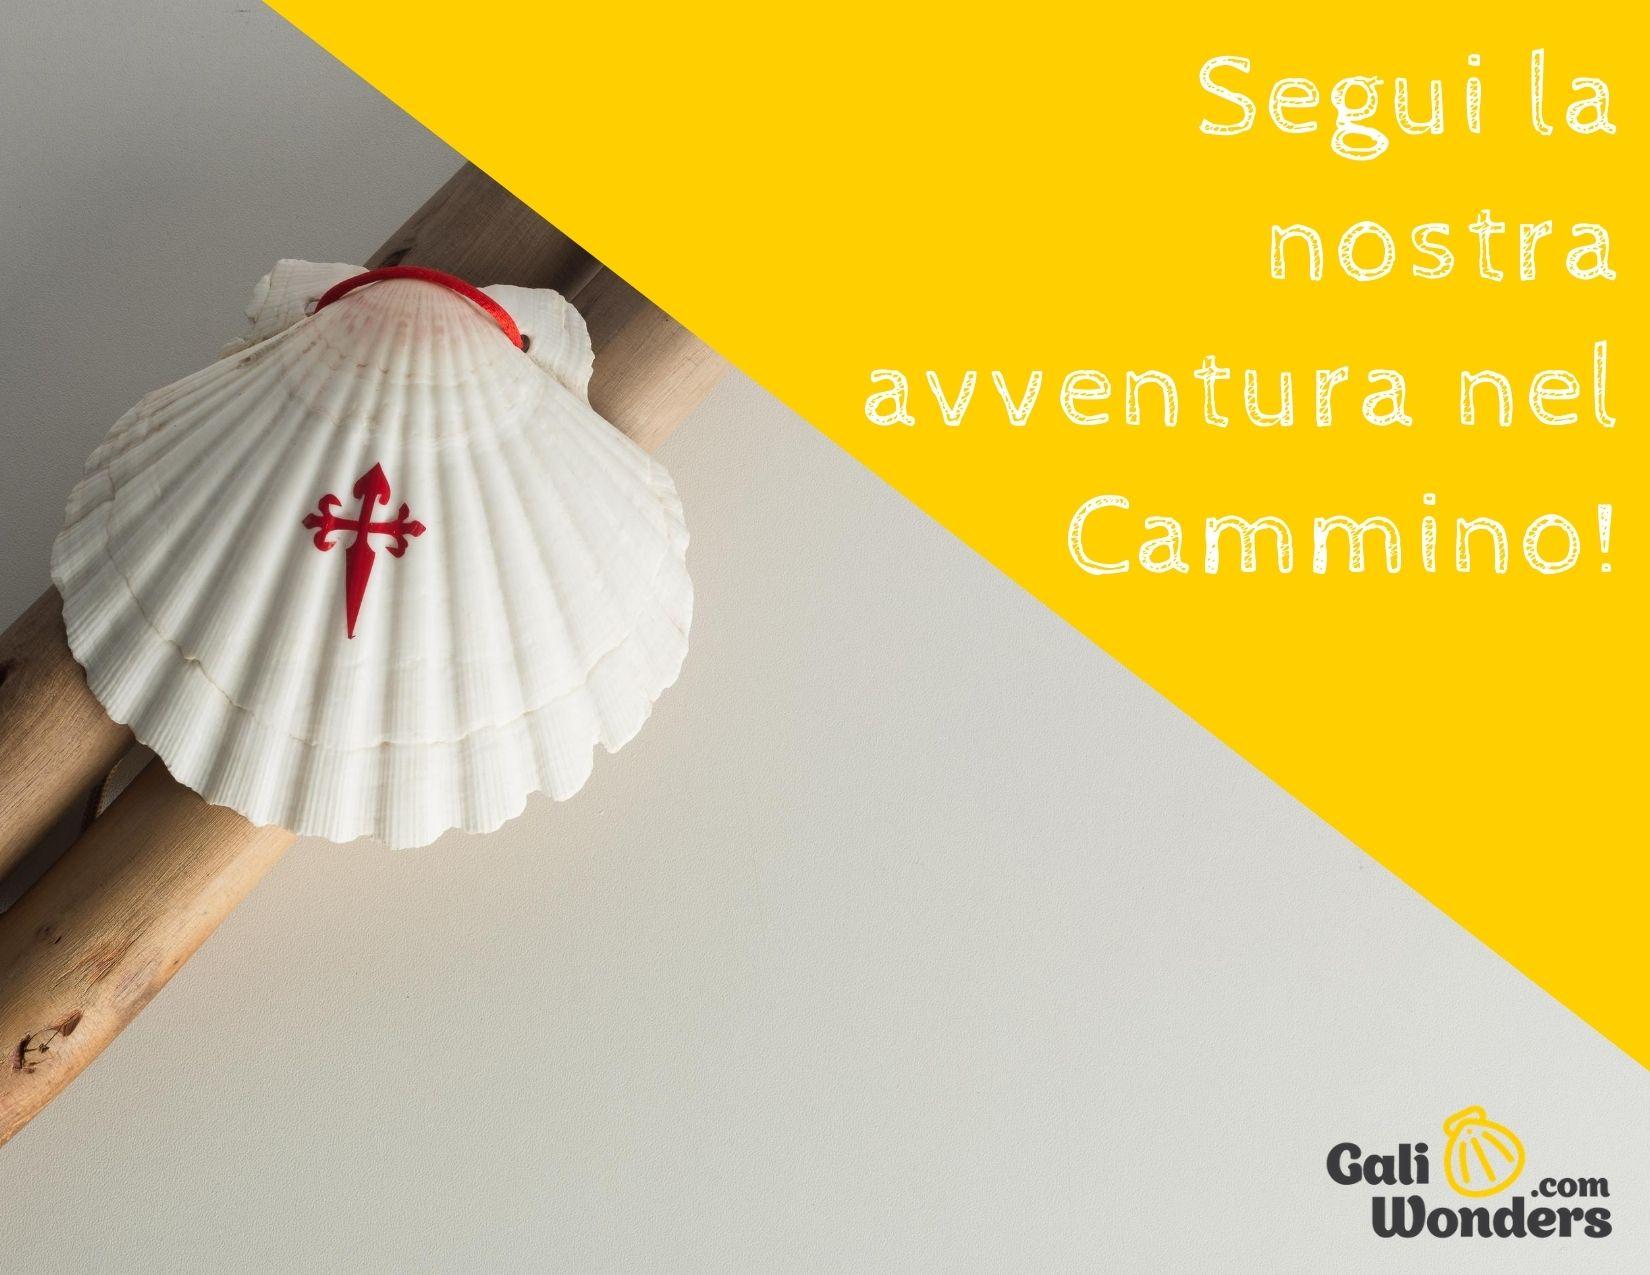 Segui la nostra avventura del Cammino di Santiago Galiwonders